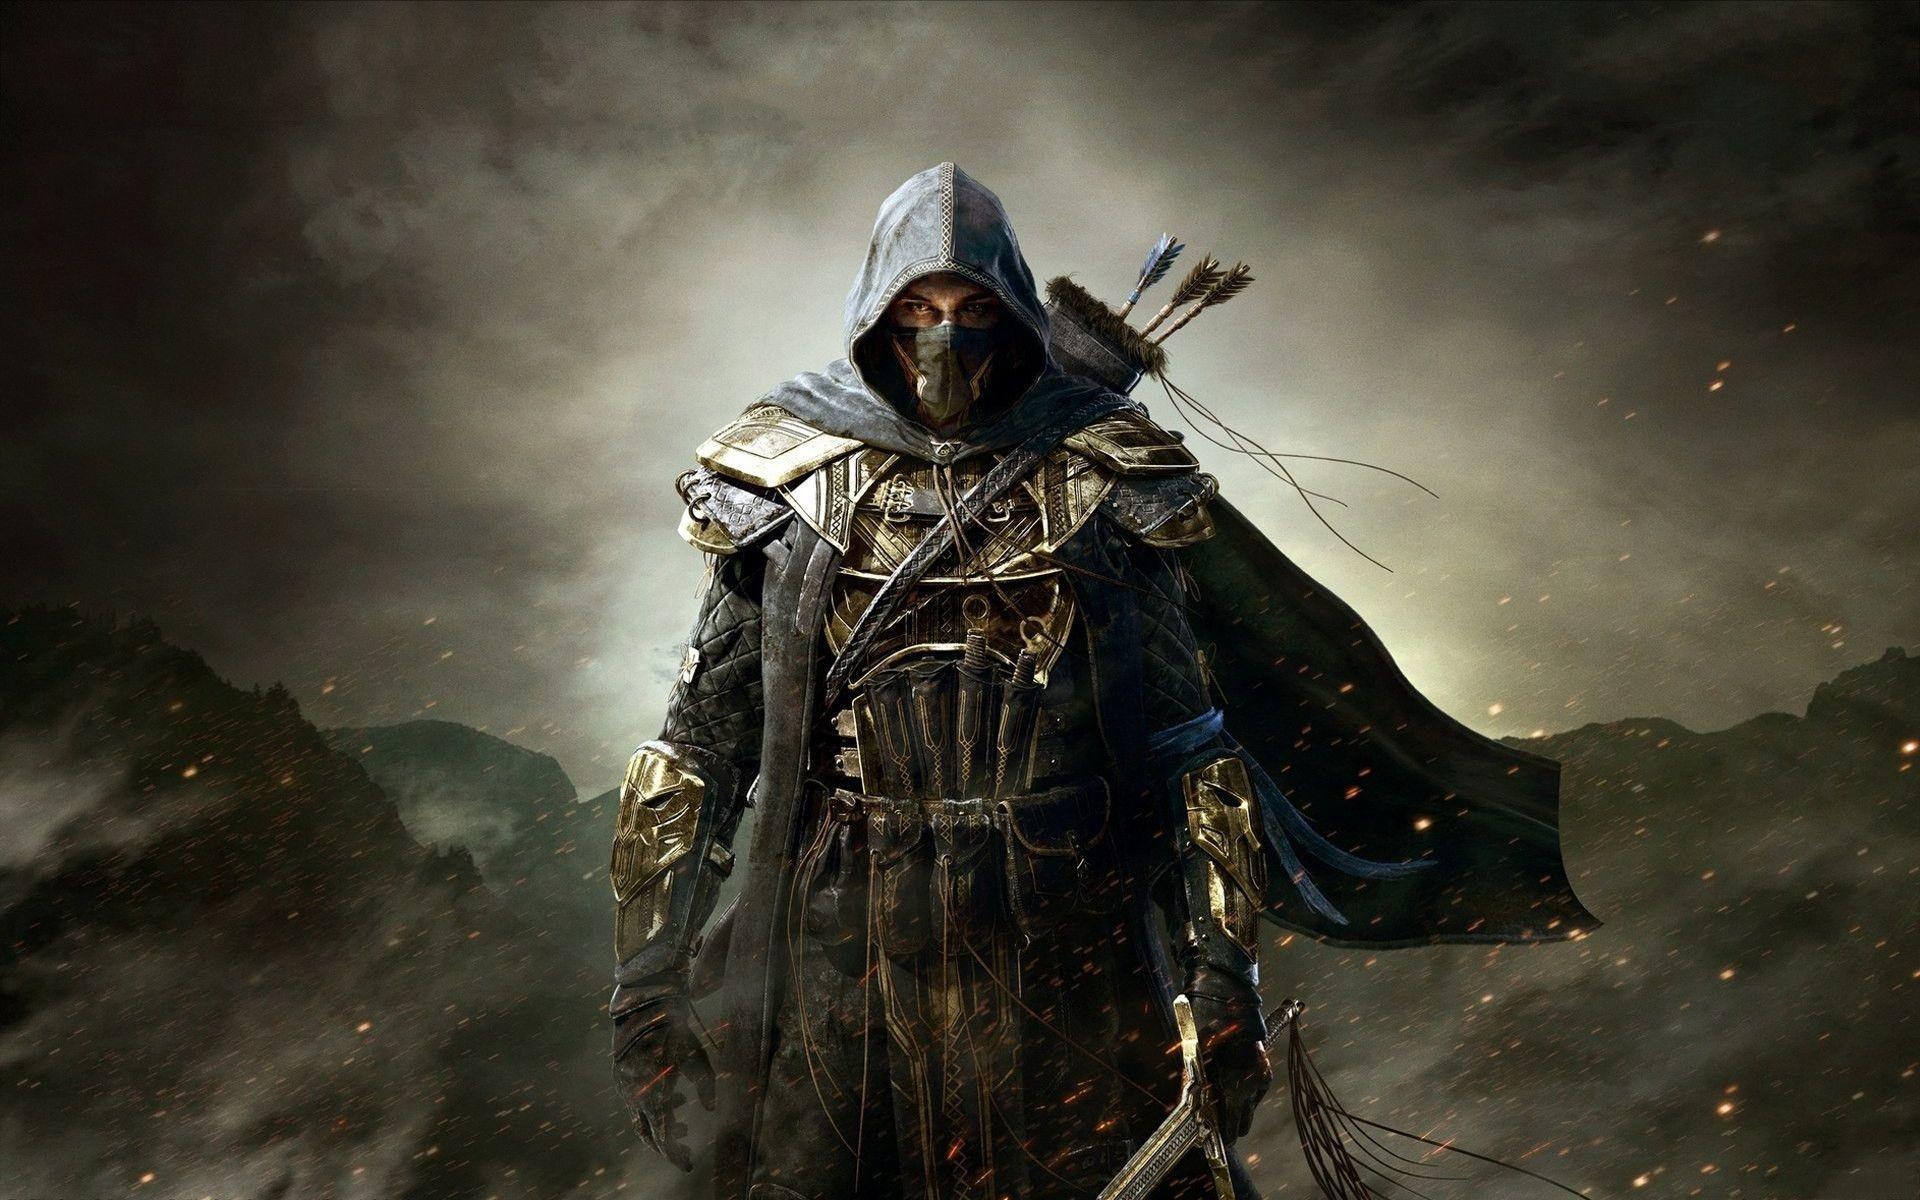 The Elder Scrolls V Skyrim HD Wallpapers Backgrounds